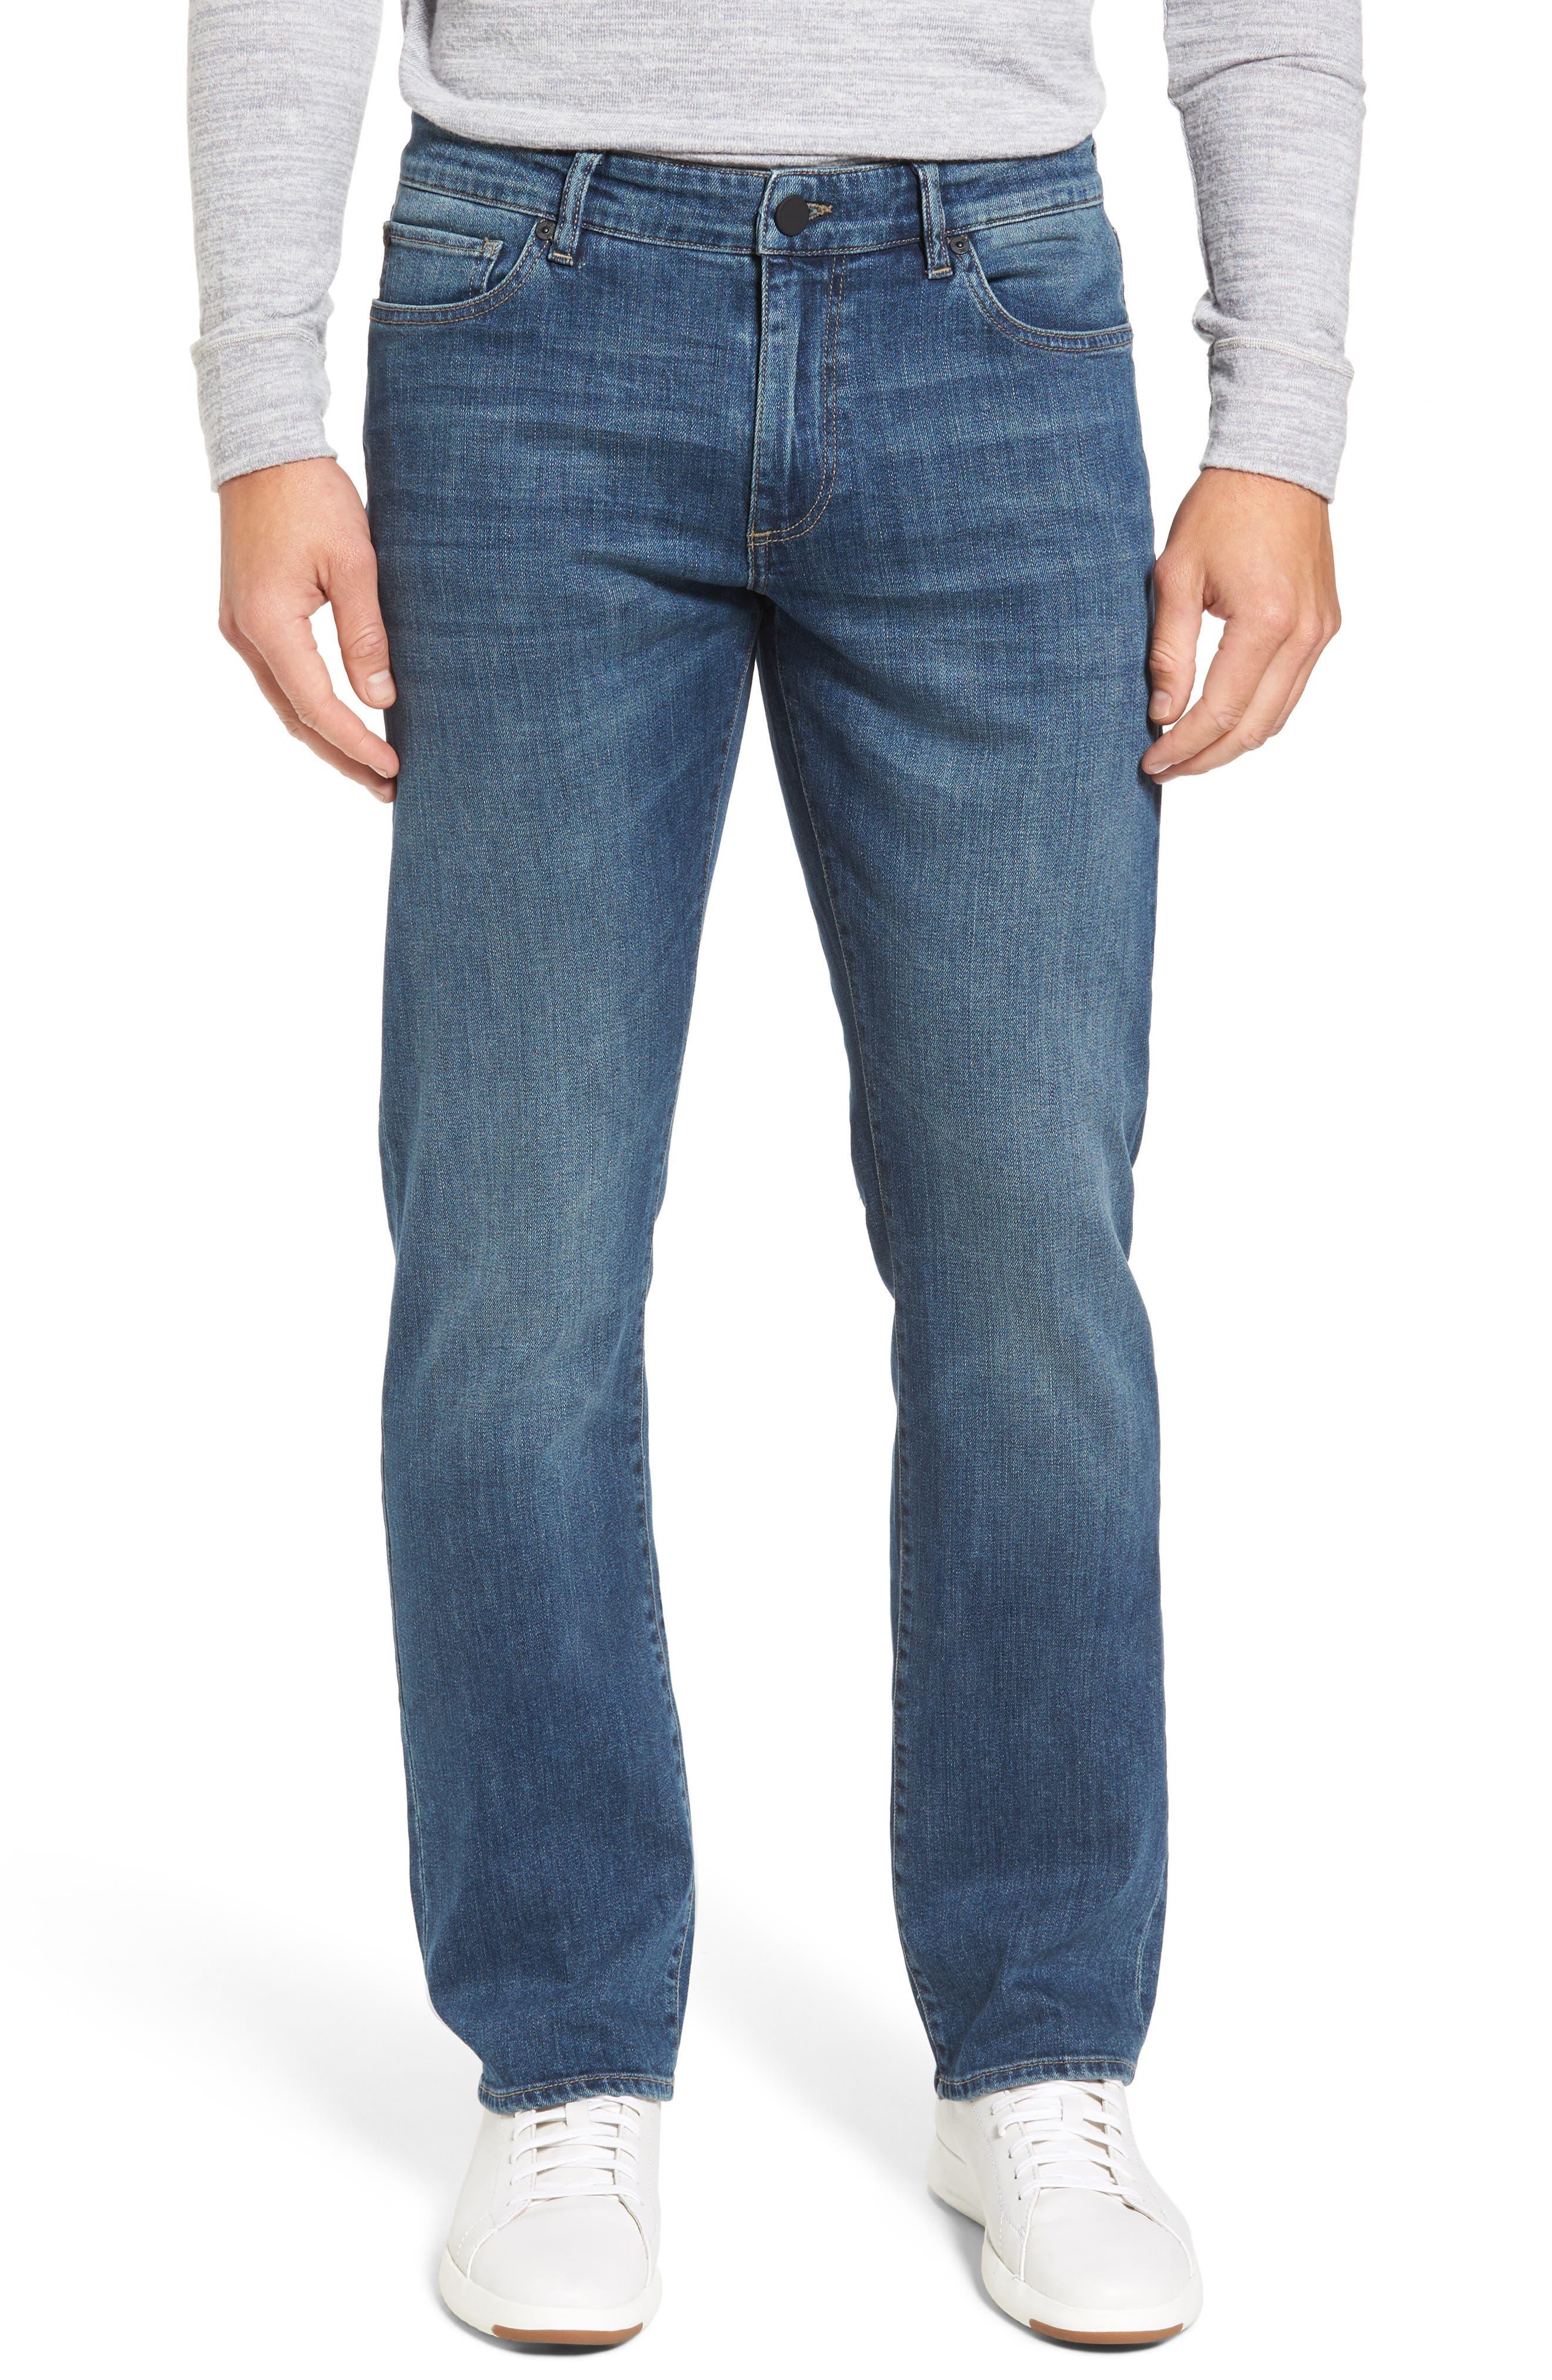 Avery Slim Straight Leg Jeans,                             Main thumbnail 1, color,